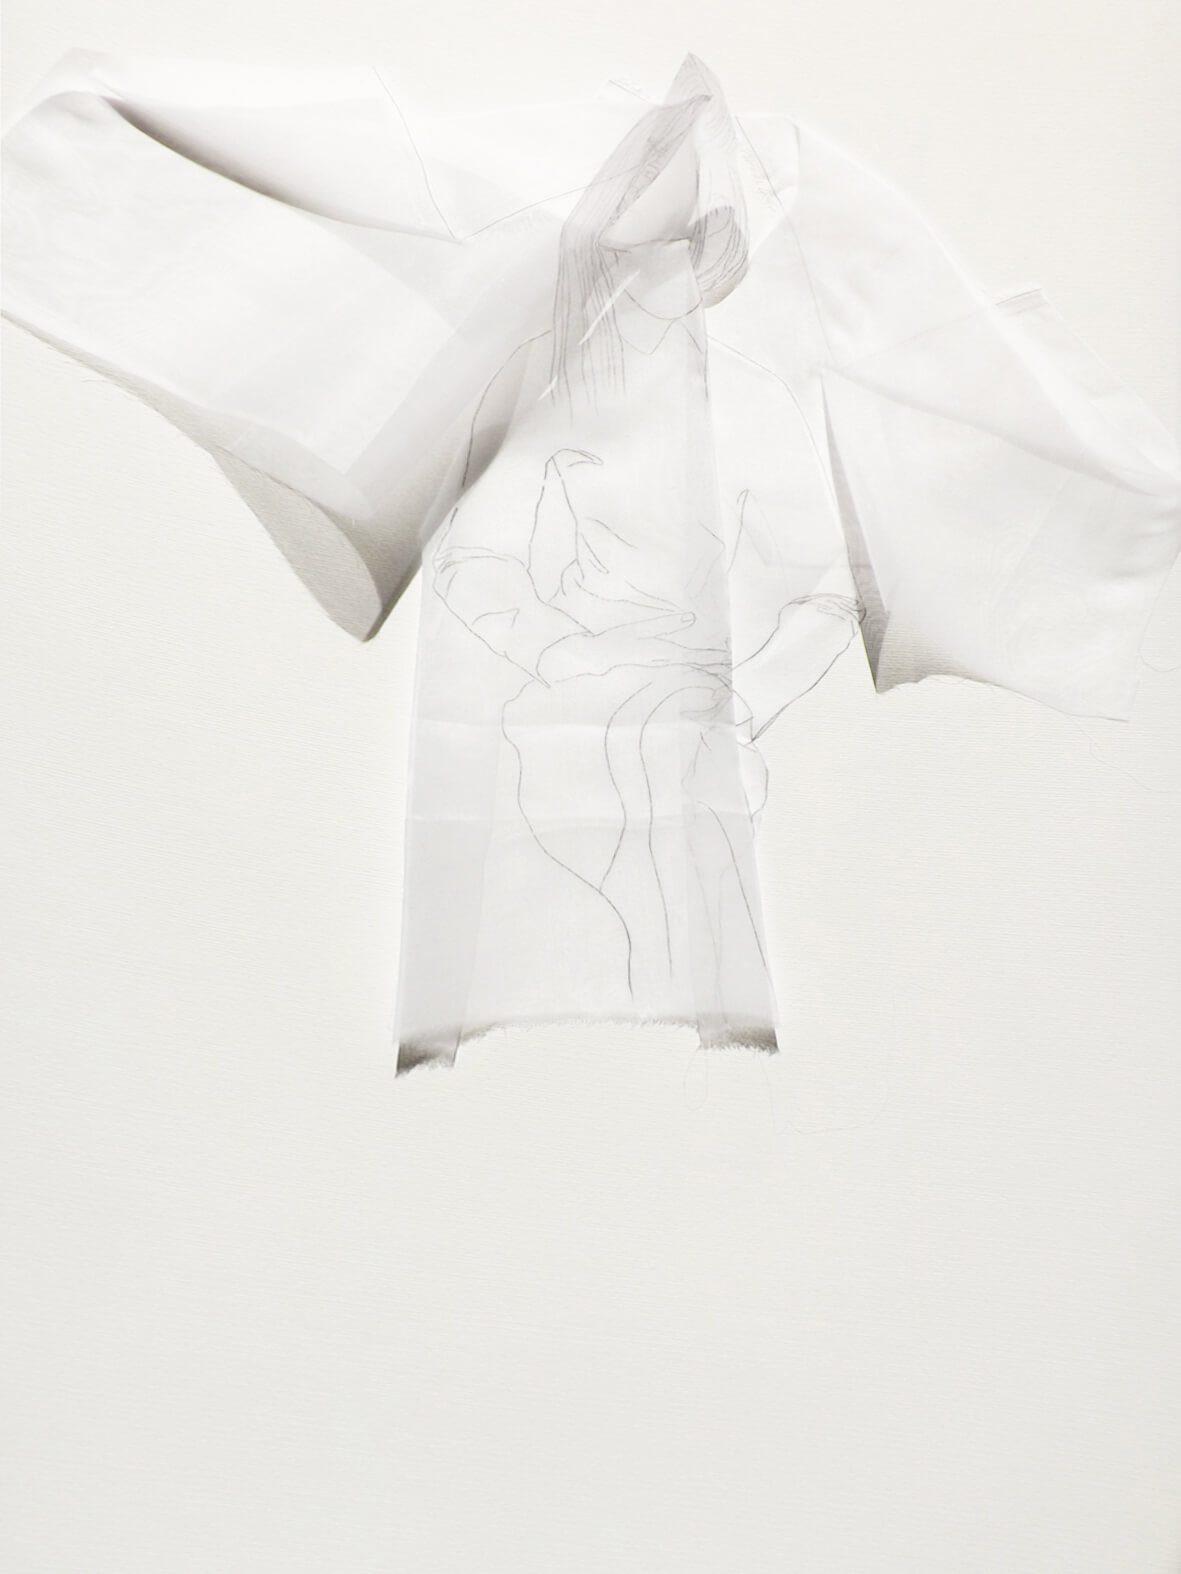 Hechizo Seda / Las princesas delicadas. Técnica, grafito sobre seda. 83x63 cms